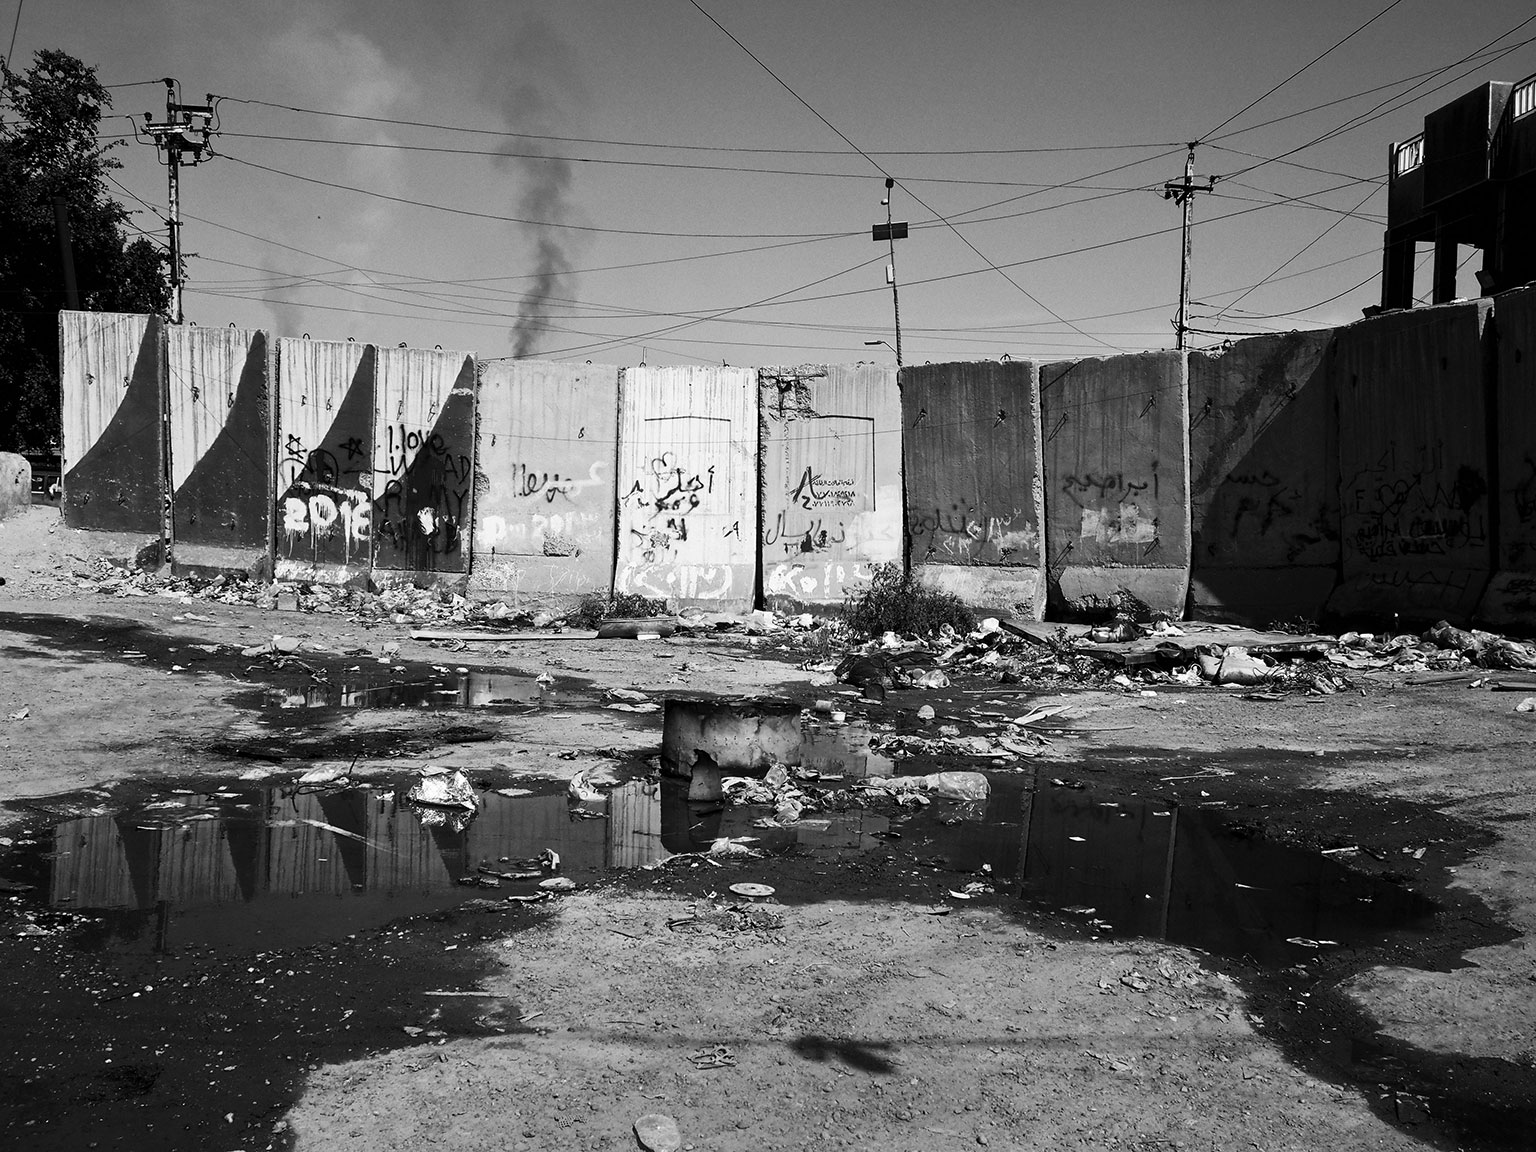 Photograph by Moises Saman